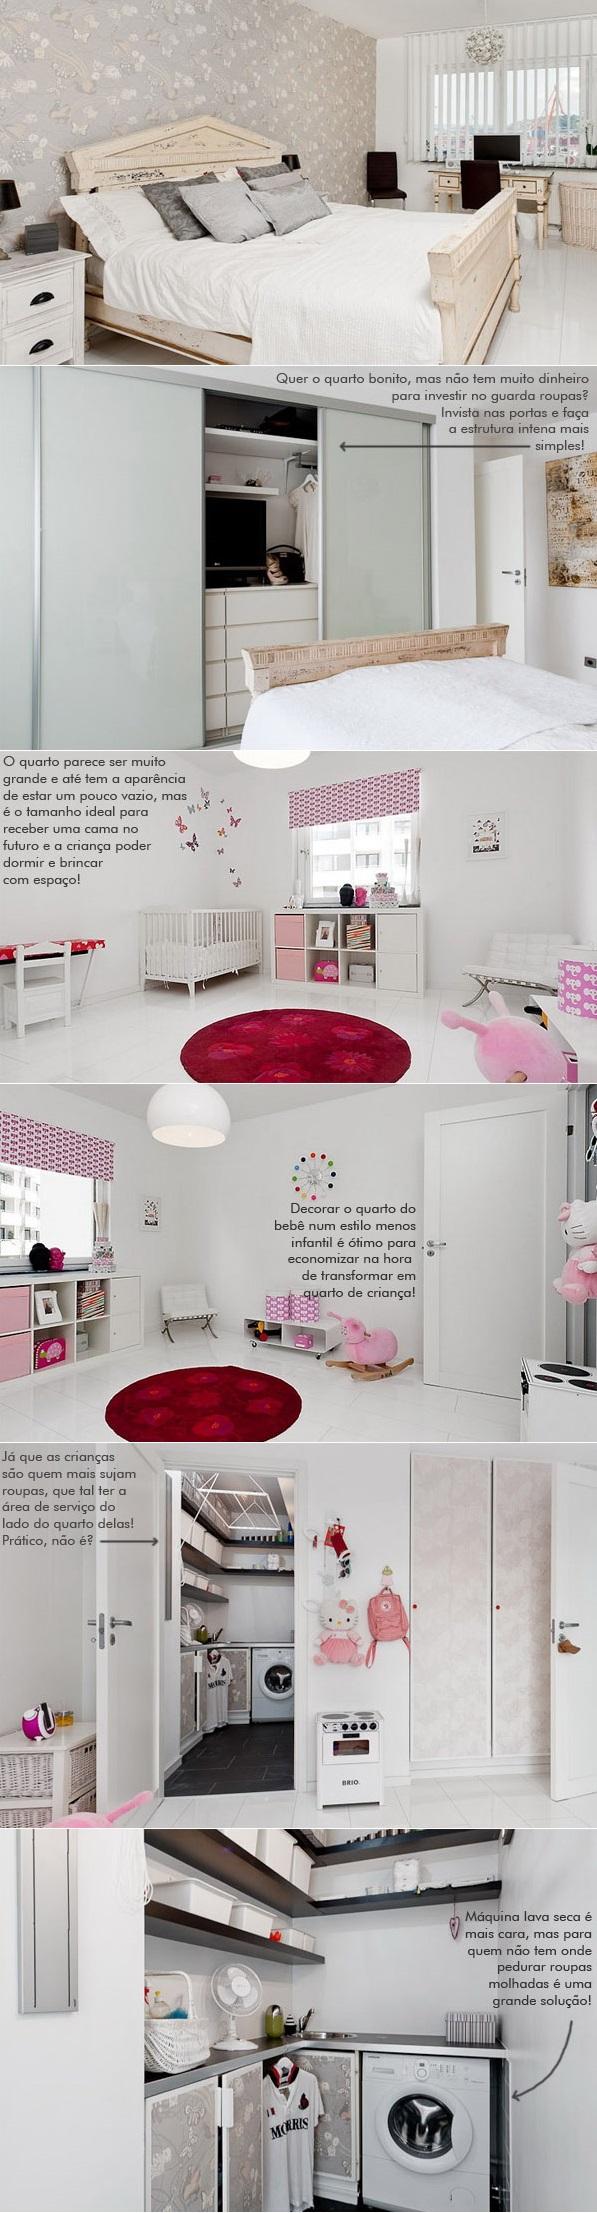 Apartamento sueco 3